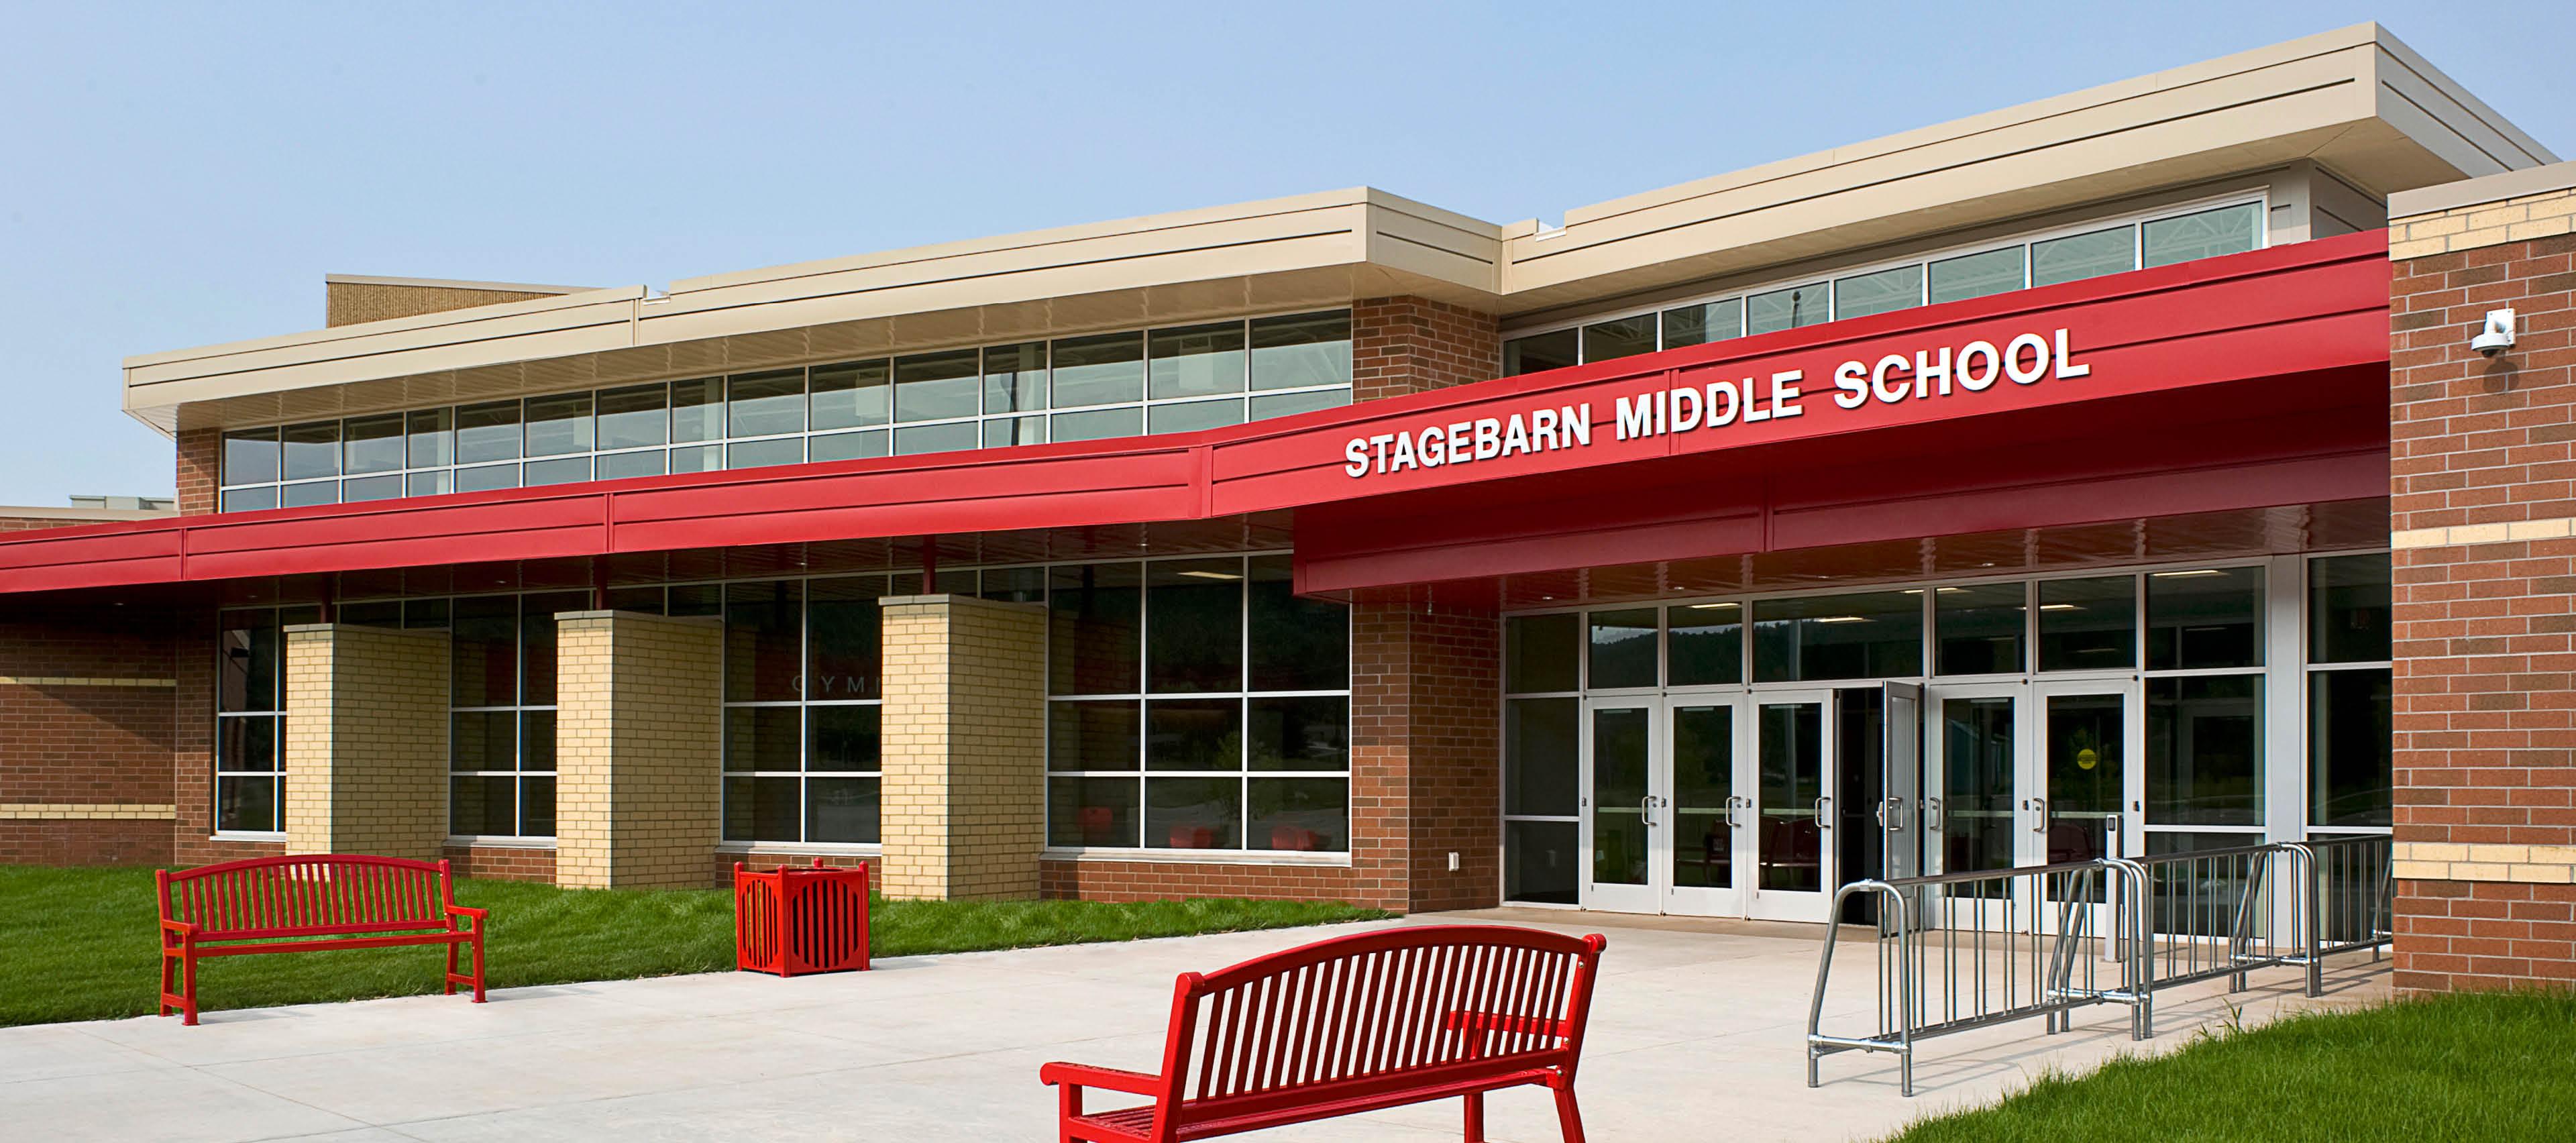 Stagebarn Middle School